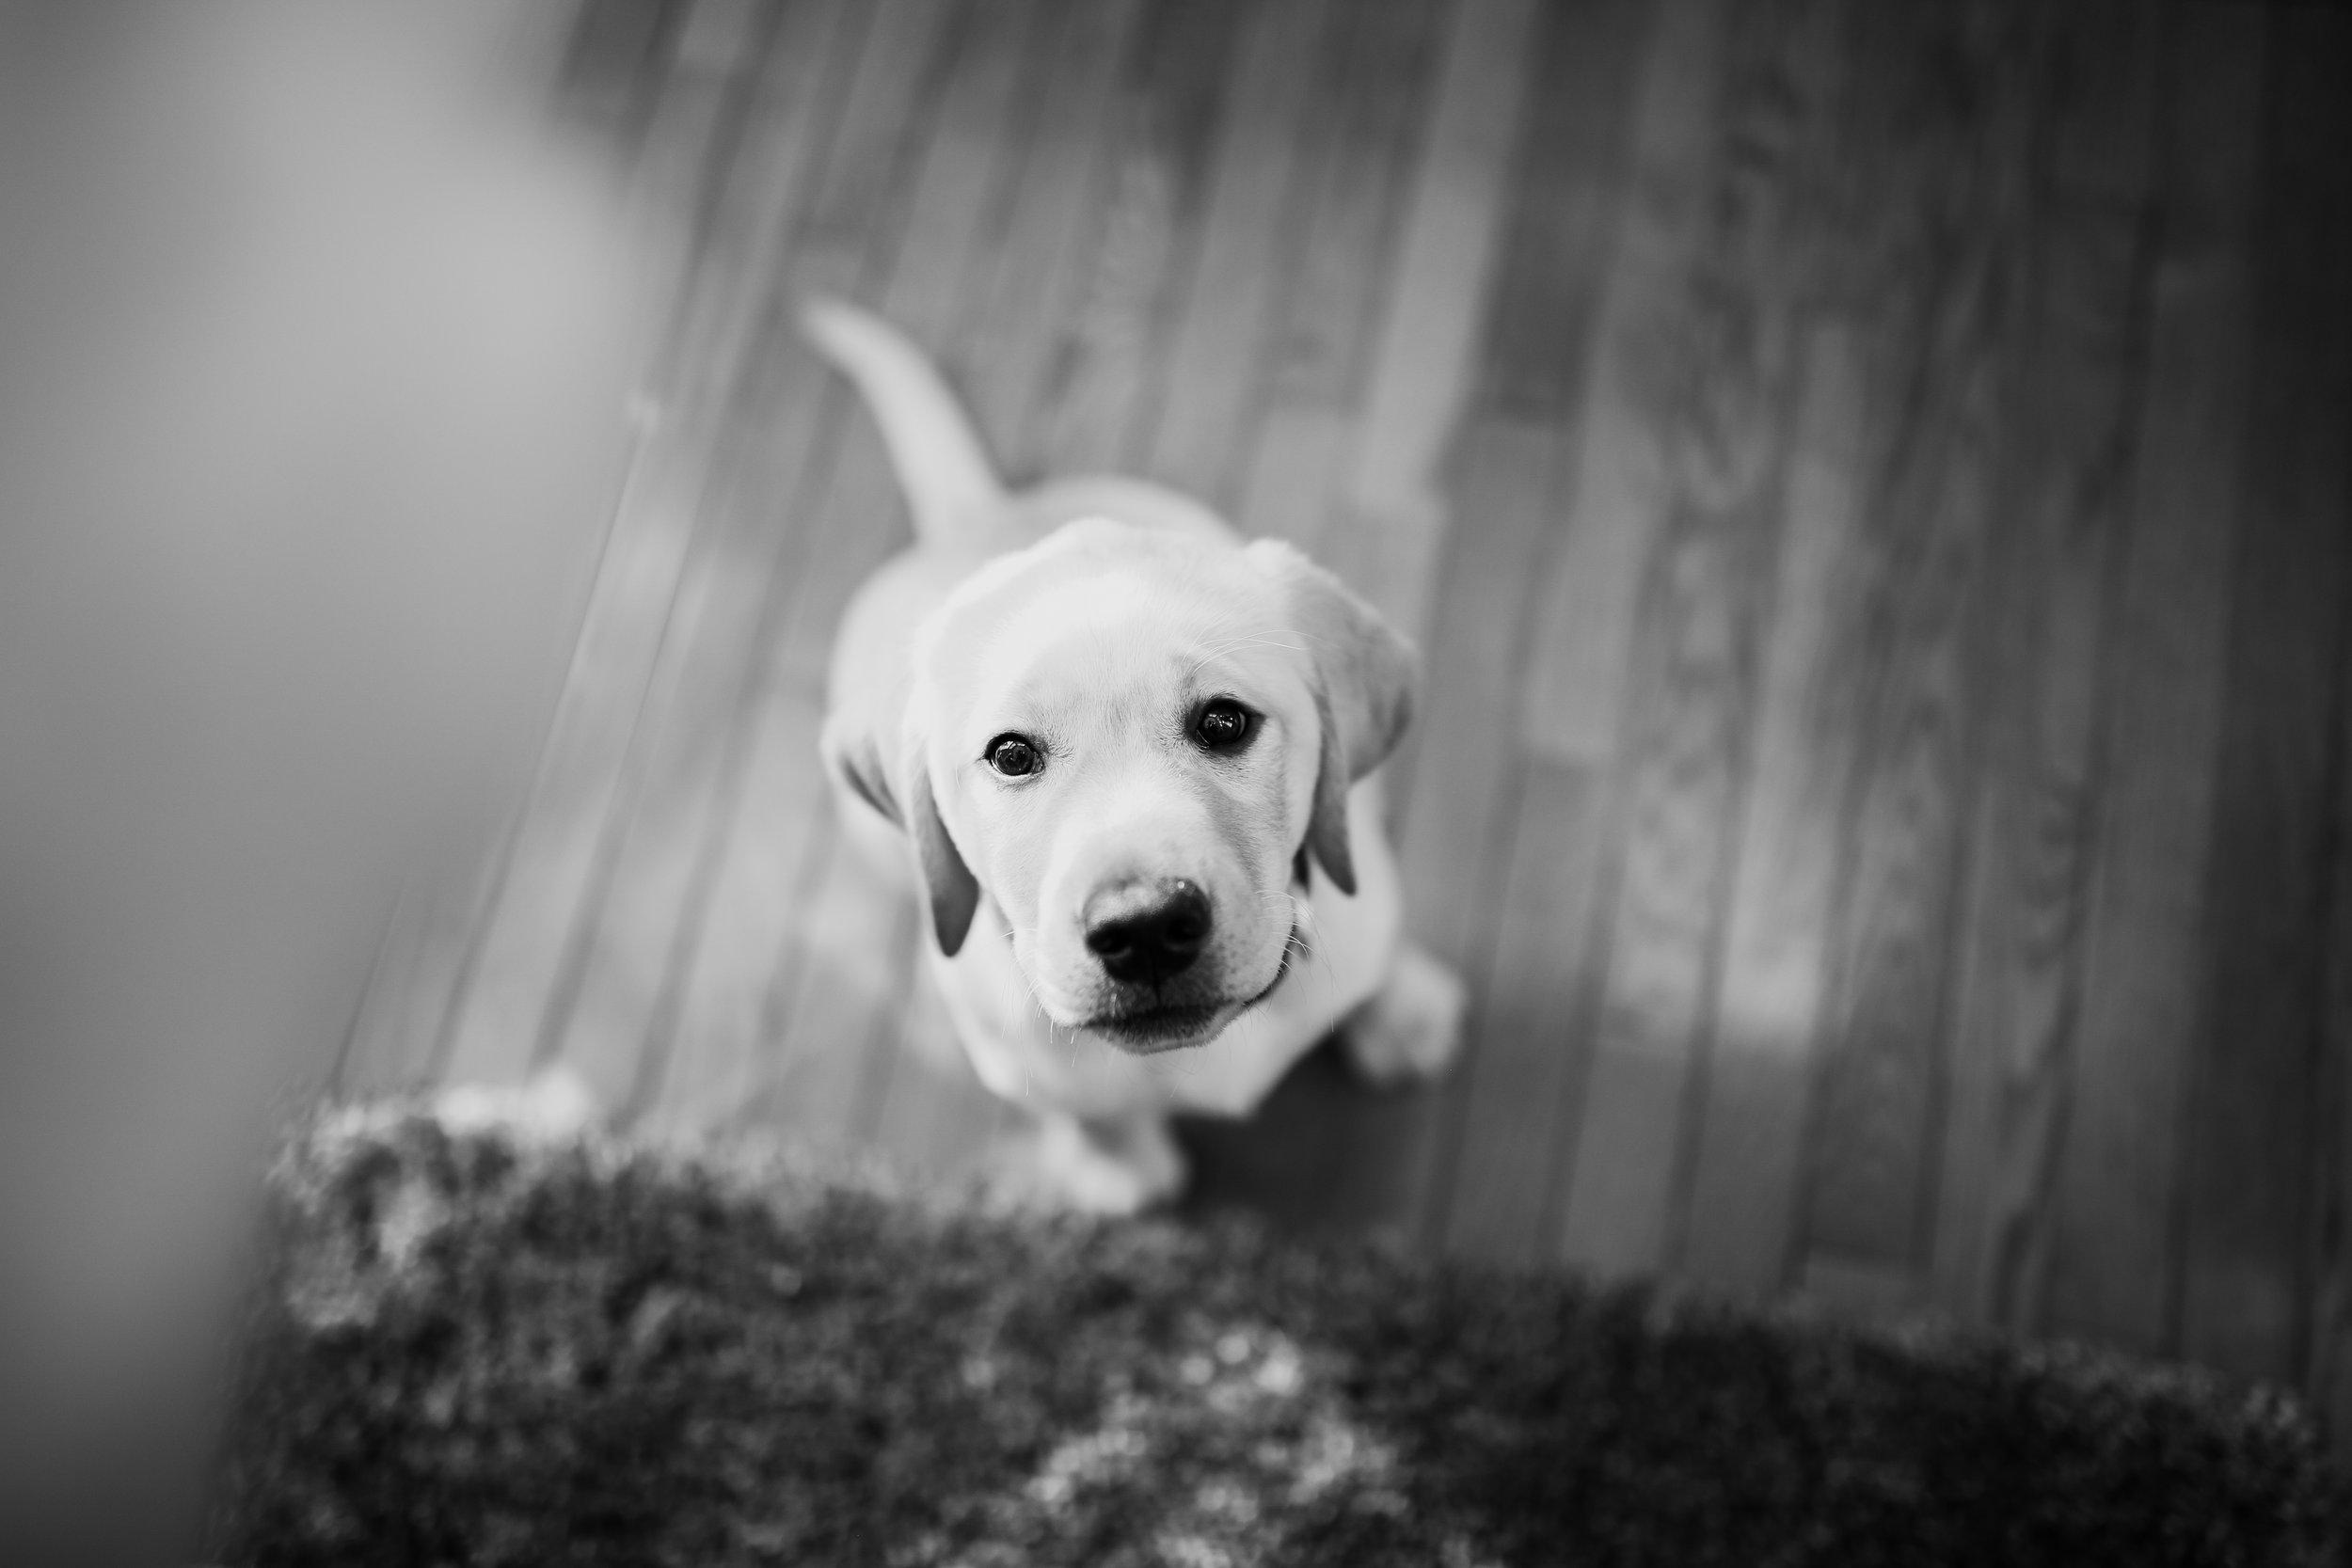 Captain_Puppy_2019-10.jpg